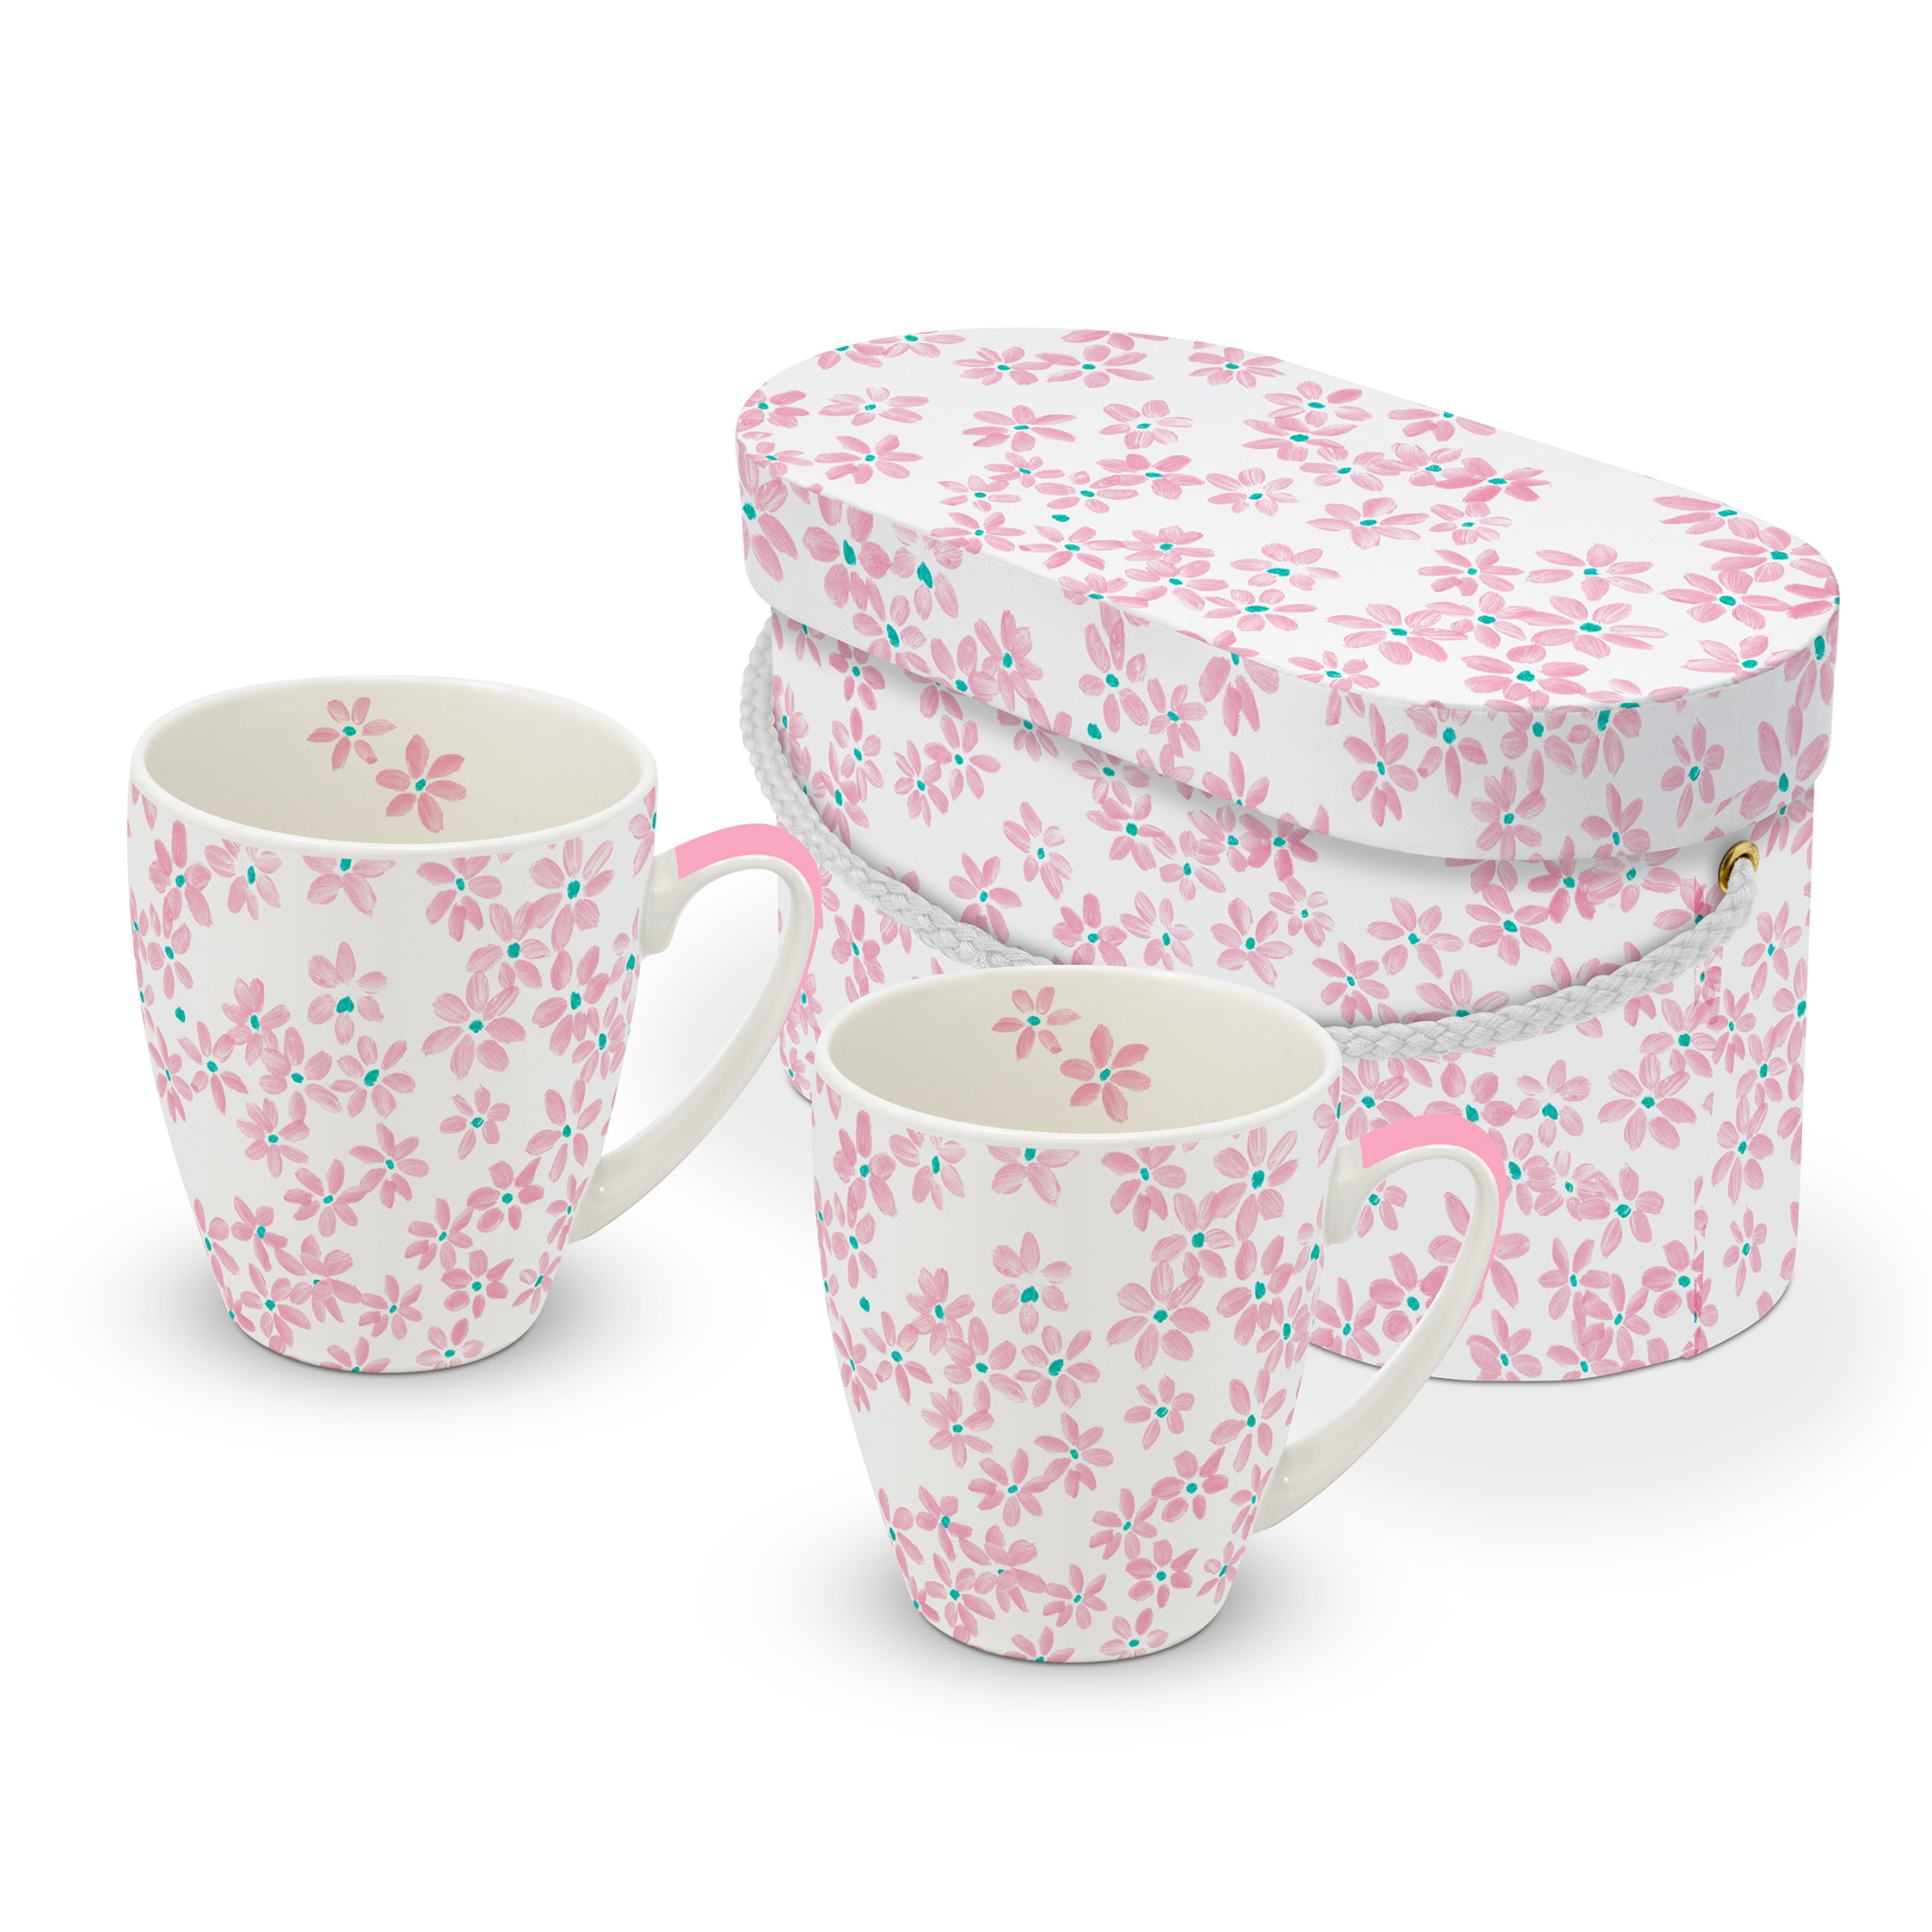 Porzellan-Henkelbecher - Hübsch in Rosé